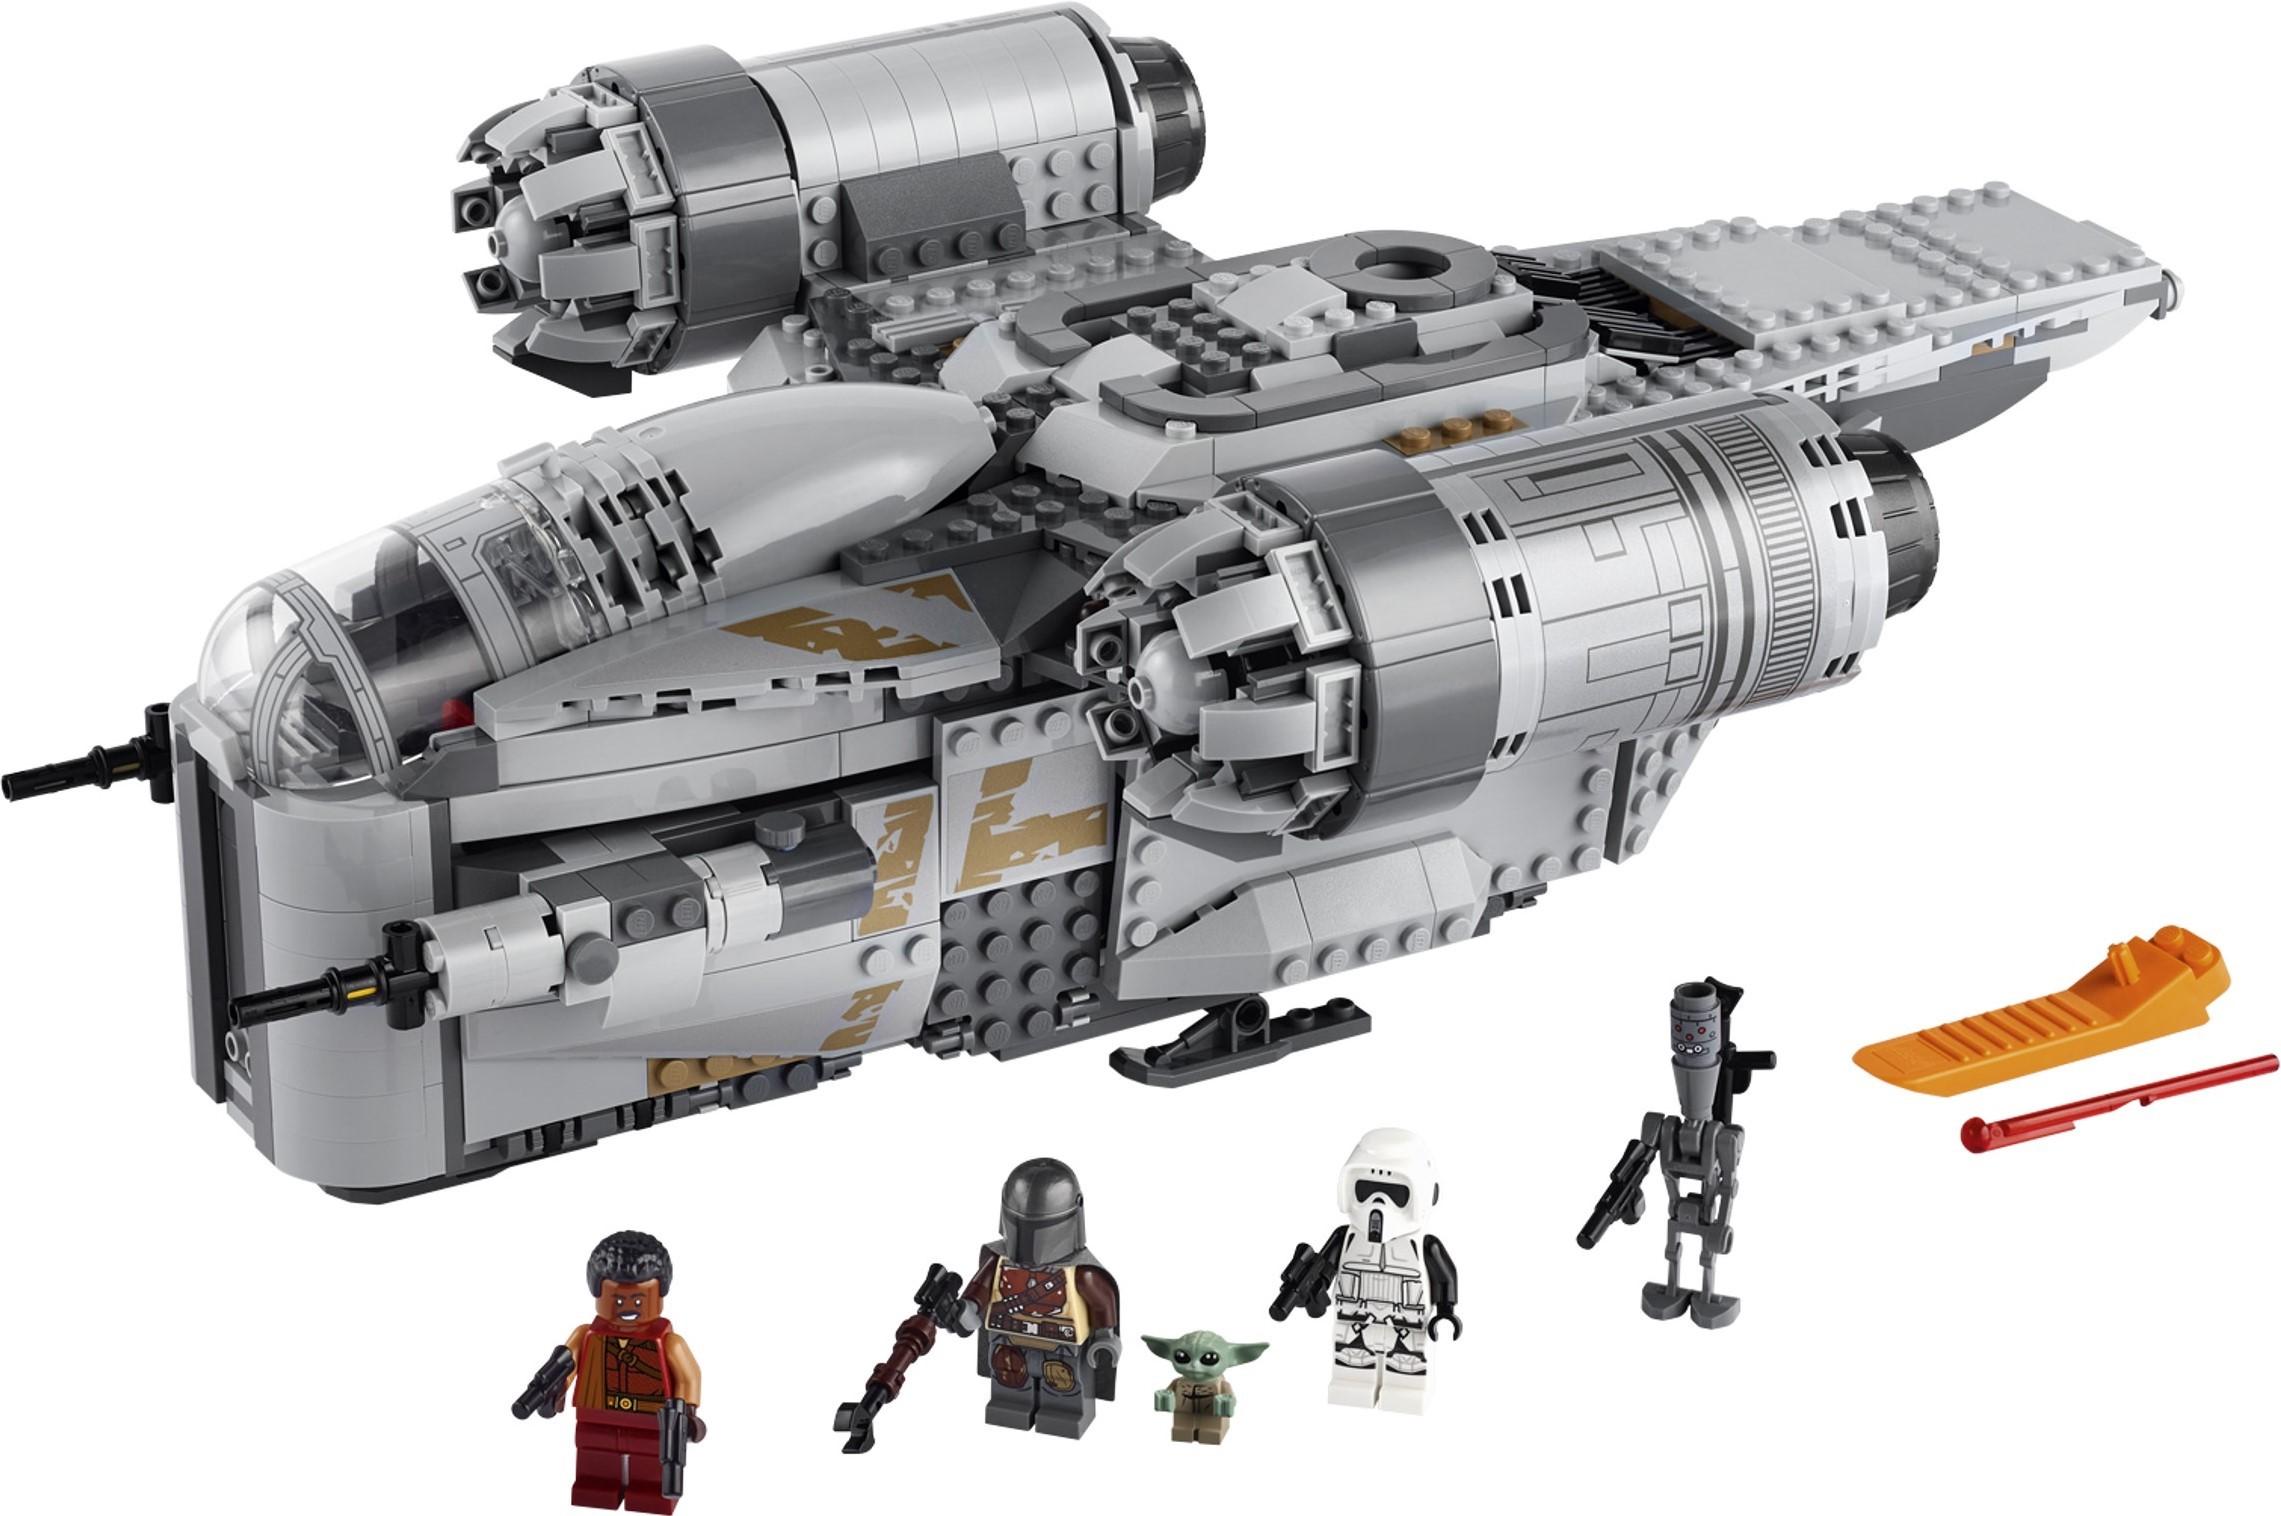 Star Wars Baby Yoda Cot Mandalorian Action Toy Custom MiniFigure For Lego Moc